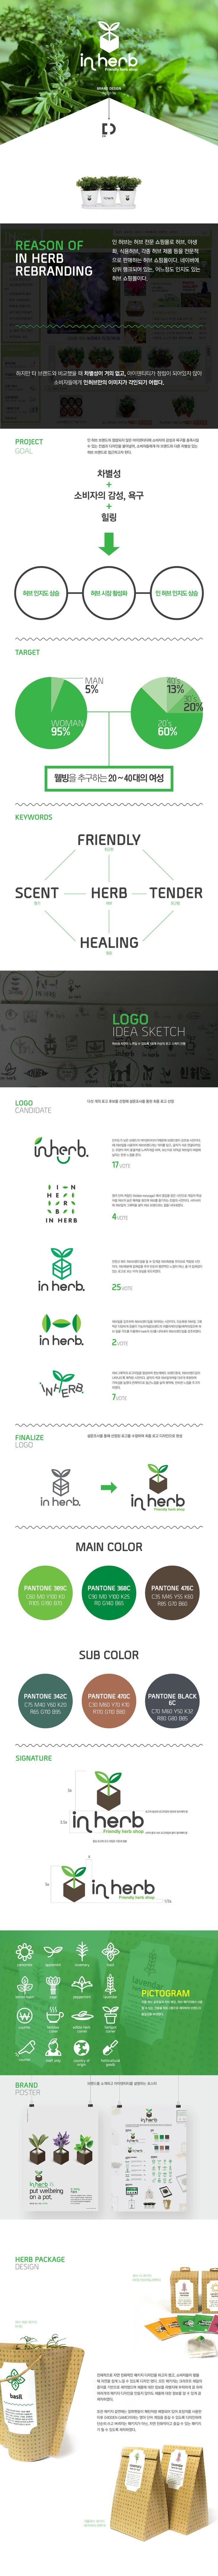 IN HERB REBRANDING PROJECT - 디지털 아트 · 영상/모션그래픽 · 브랜딩/편집, 디지털 아트, 영상/모션그래픽, 브랜딩/편집, 브랜딩/편집